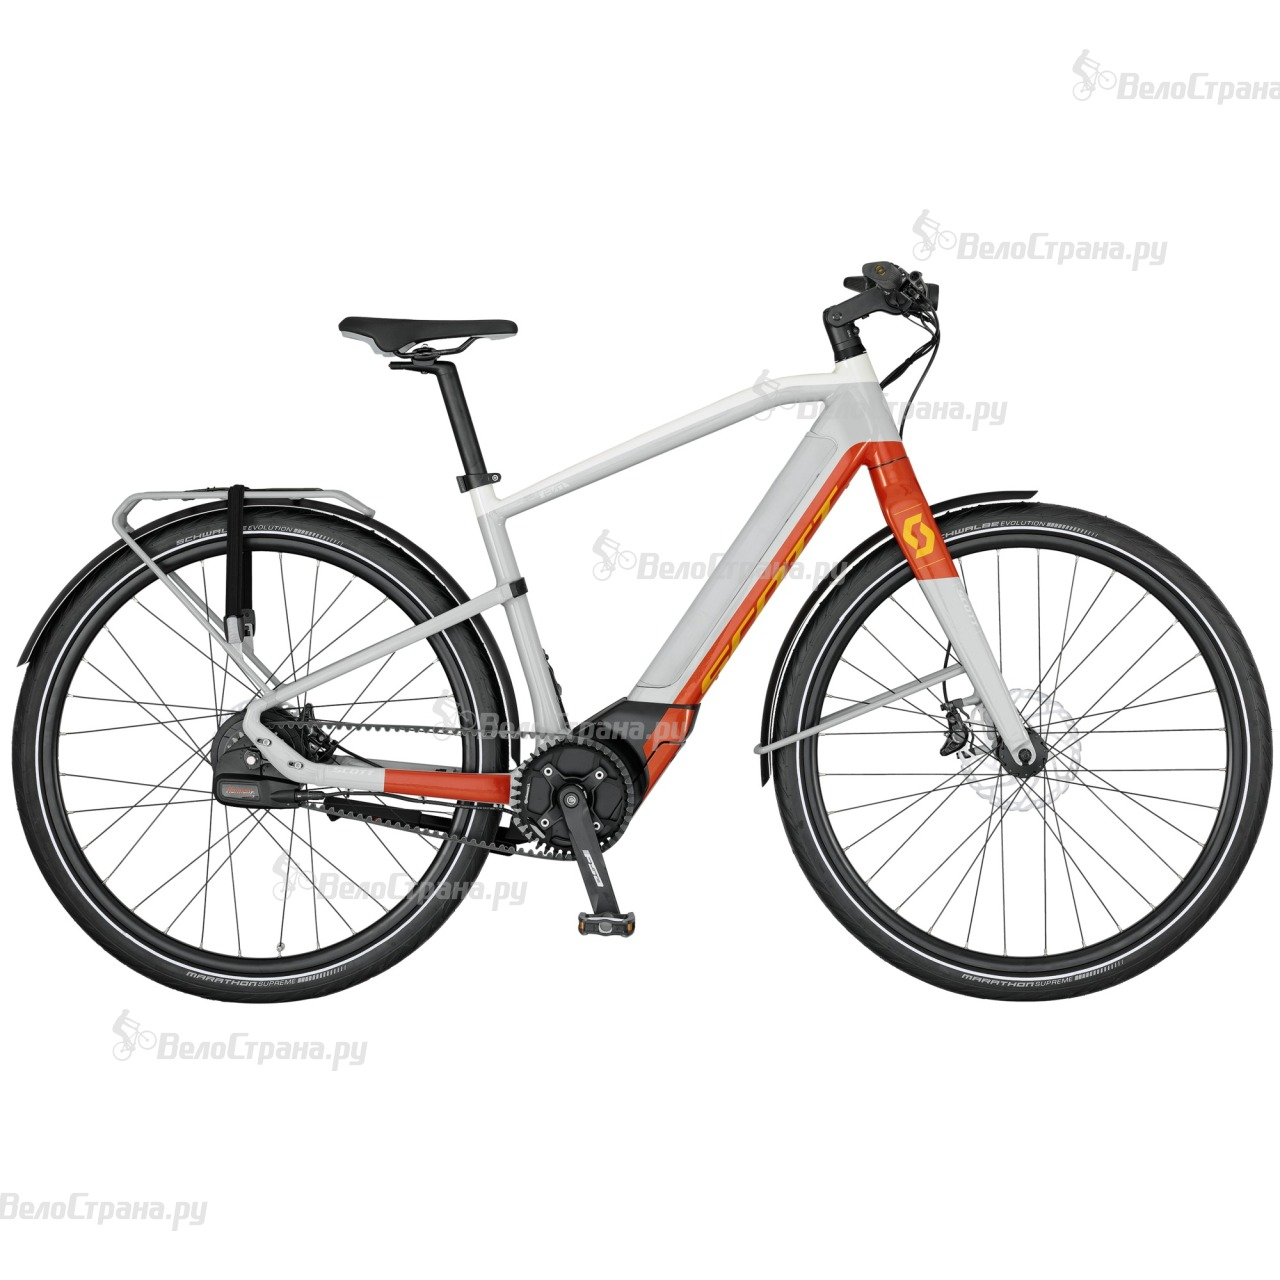 Велосипед Scott E-Silence Evo (2017) велосипед scott e silence speed 20 2017